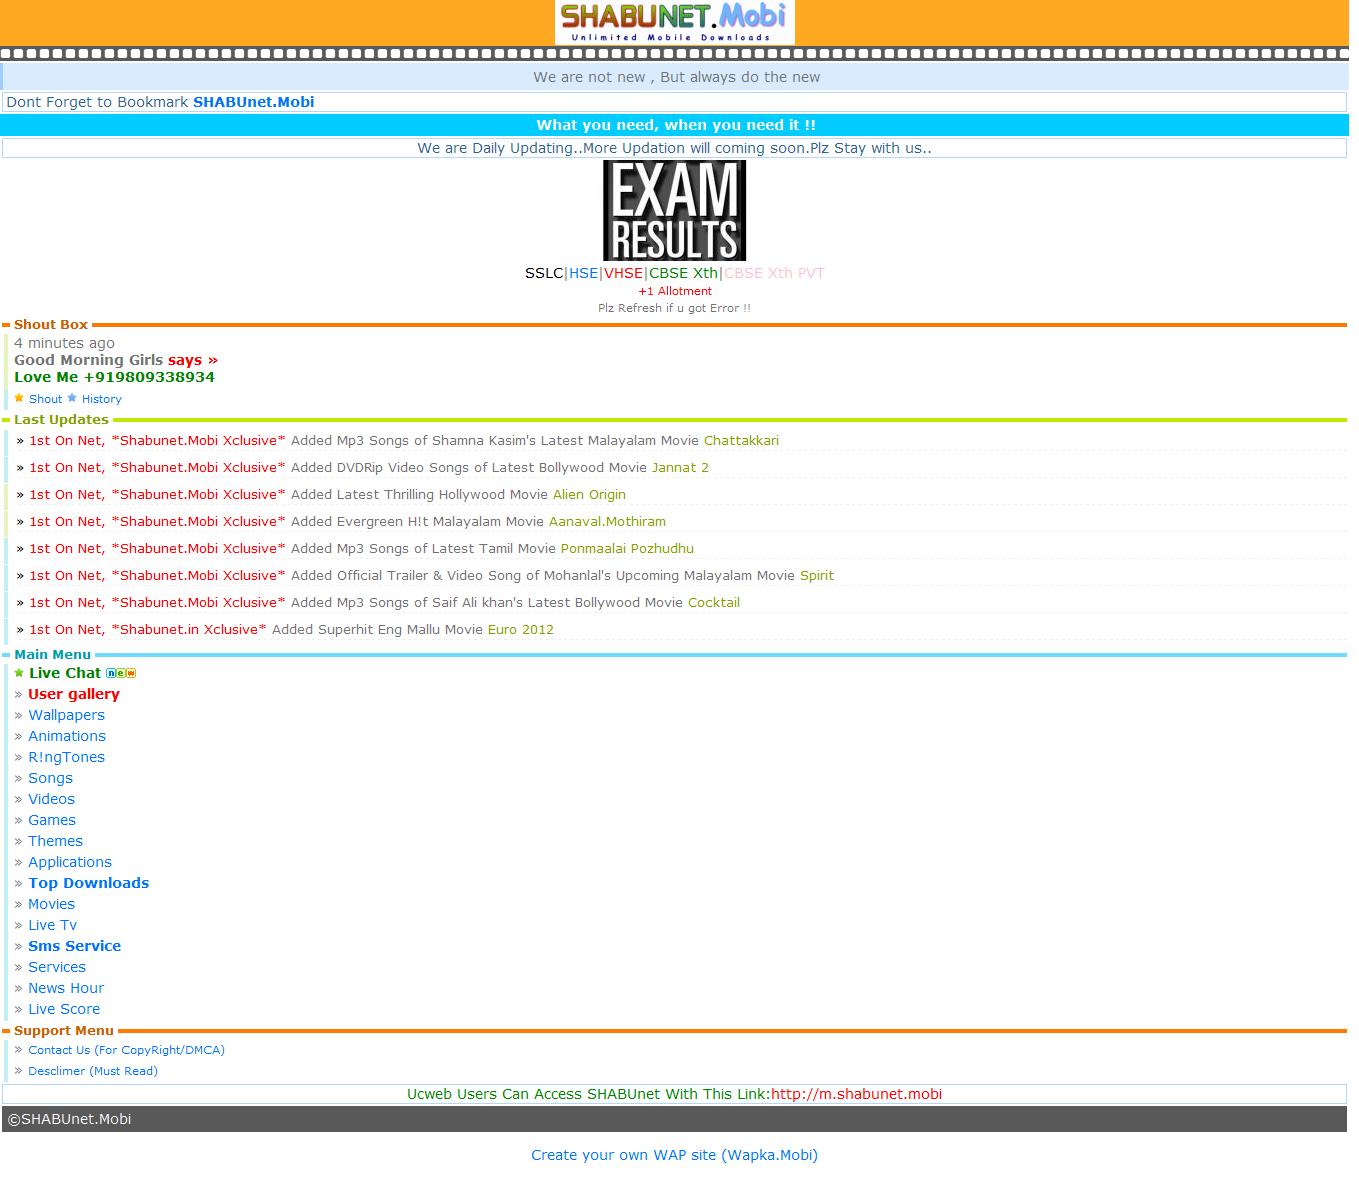 Download Mp3 Taki Taki Wapka Mobi: A Complte Website Guide